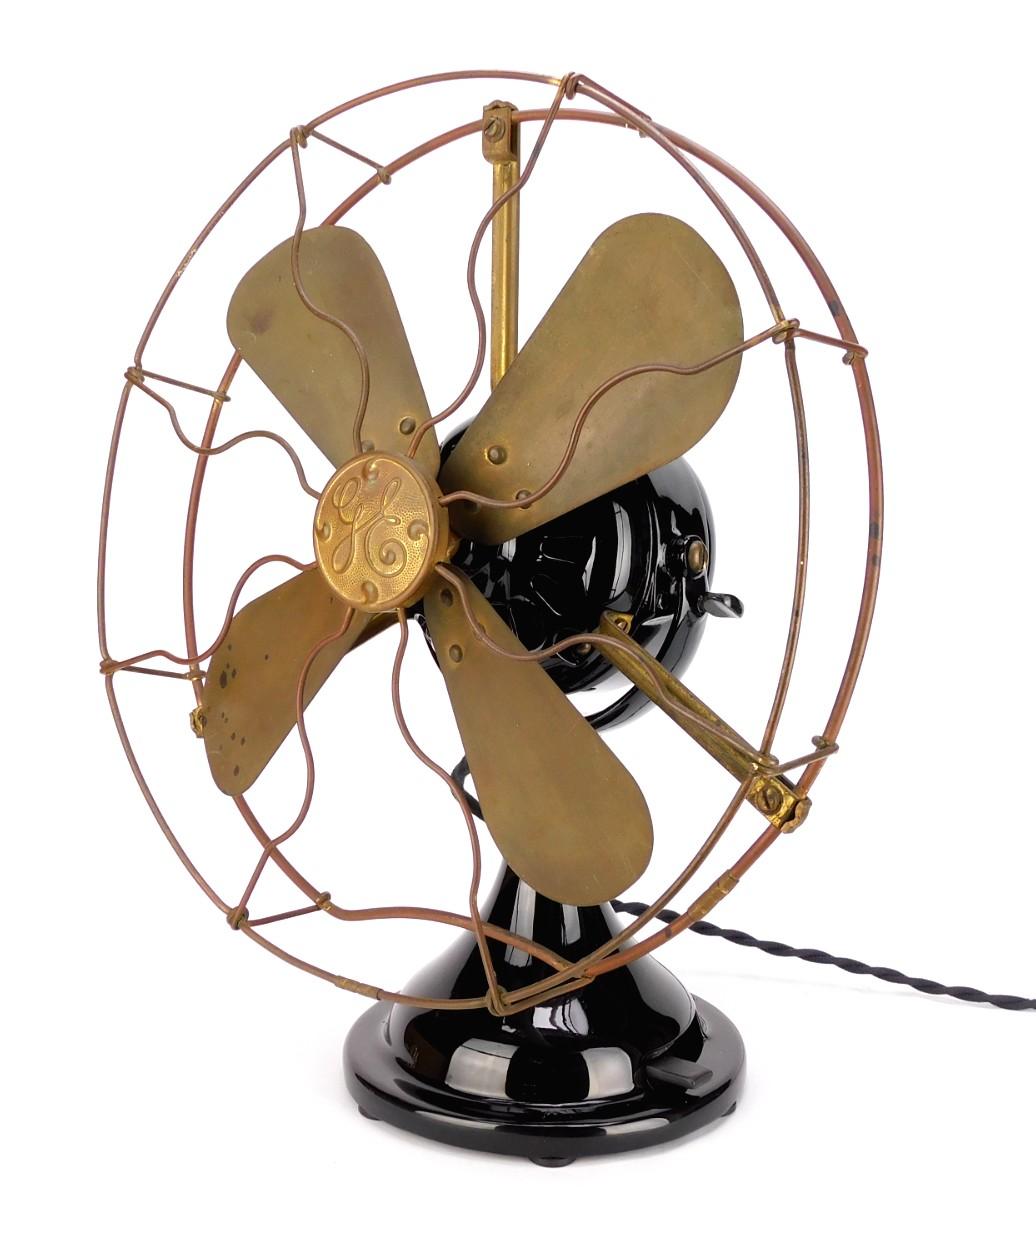 "Circa 1914 12"" GE Small Motor Yoke (SMY) Desk Fan Restored/ Original"